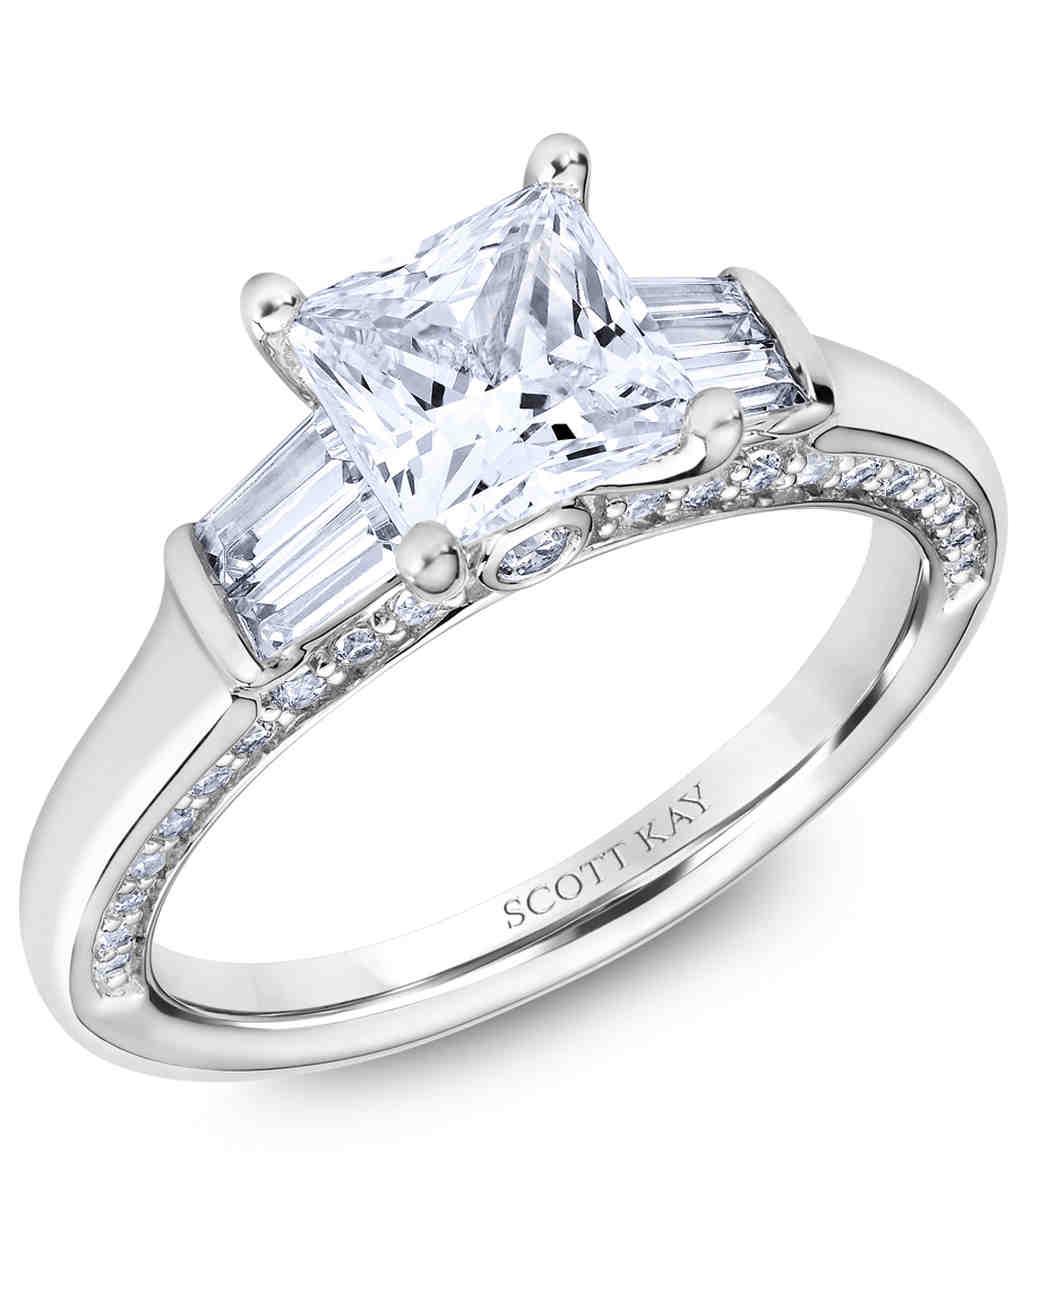 Princess Cut Diamond Engagement Rings Martha Stewart